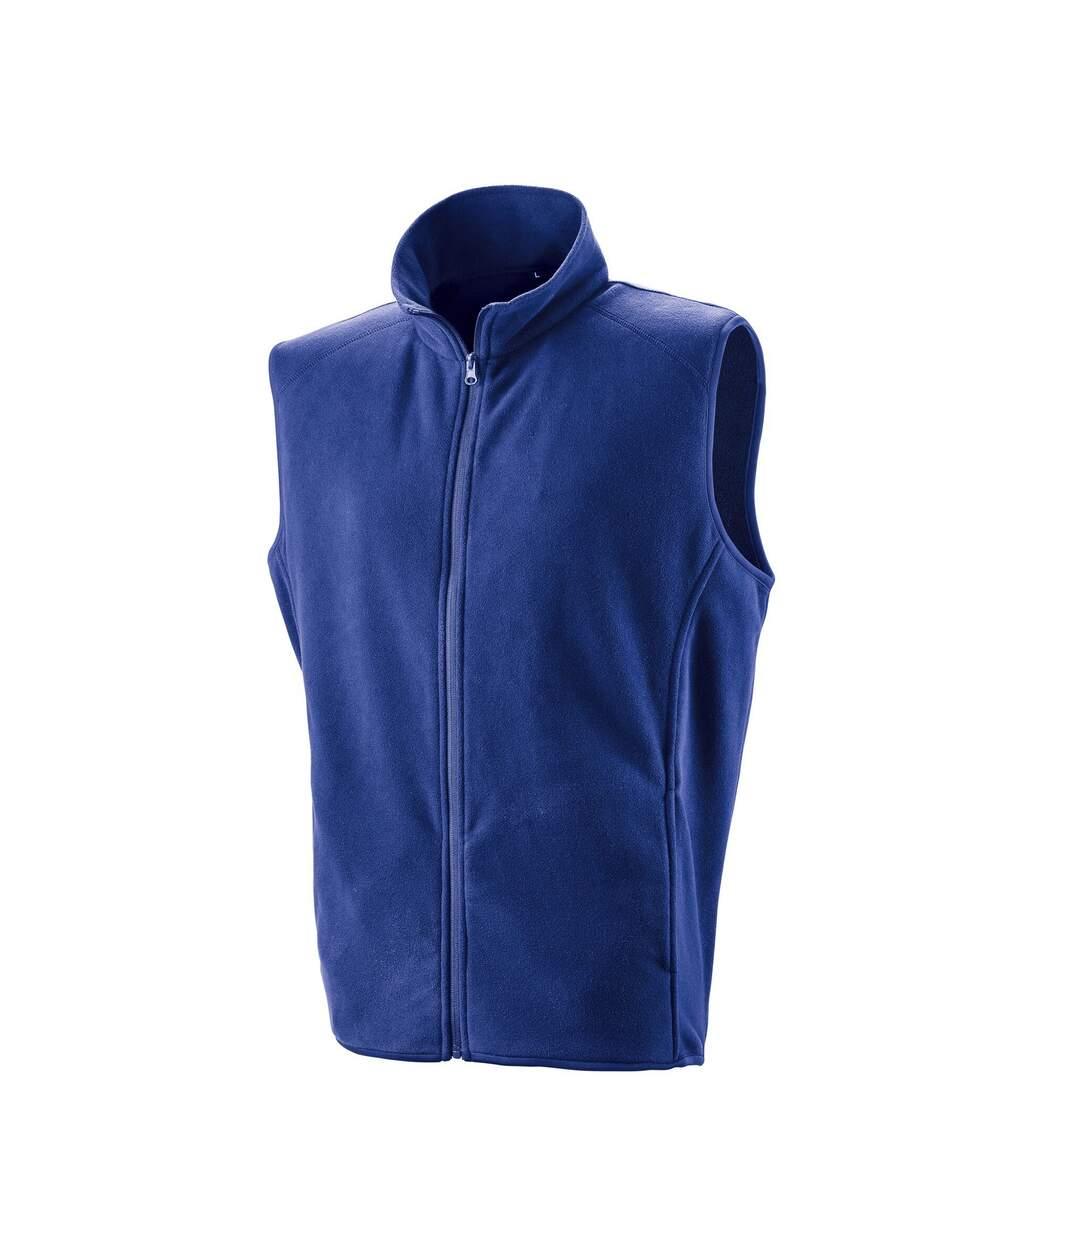 Result Core Mens Micro Fleece Gilet (Royal) - UTPC3013